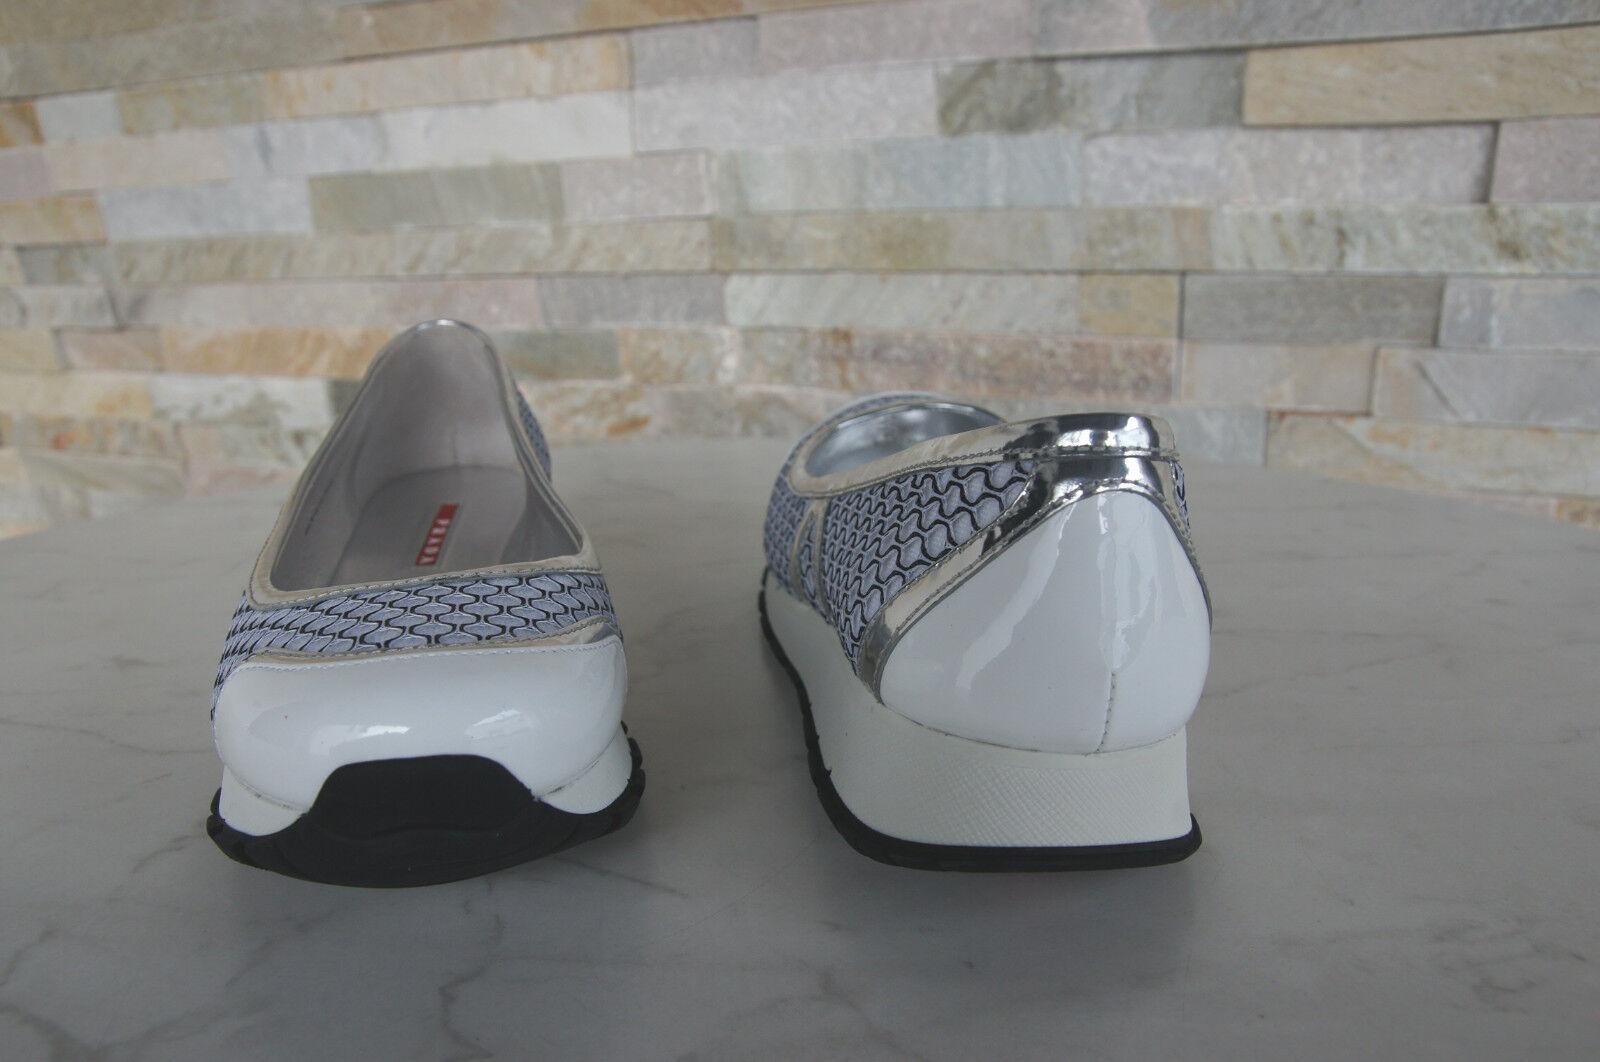 PRADA Gr 38,5 Ballerinas Slipper Schuhe NEU Lack BEE 3F6157 weiss NEU Schuhe c9c8c1